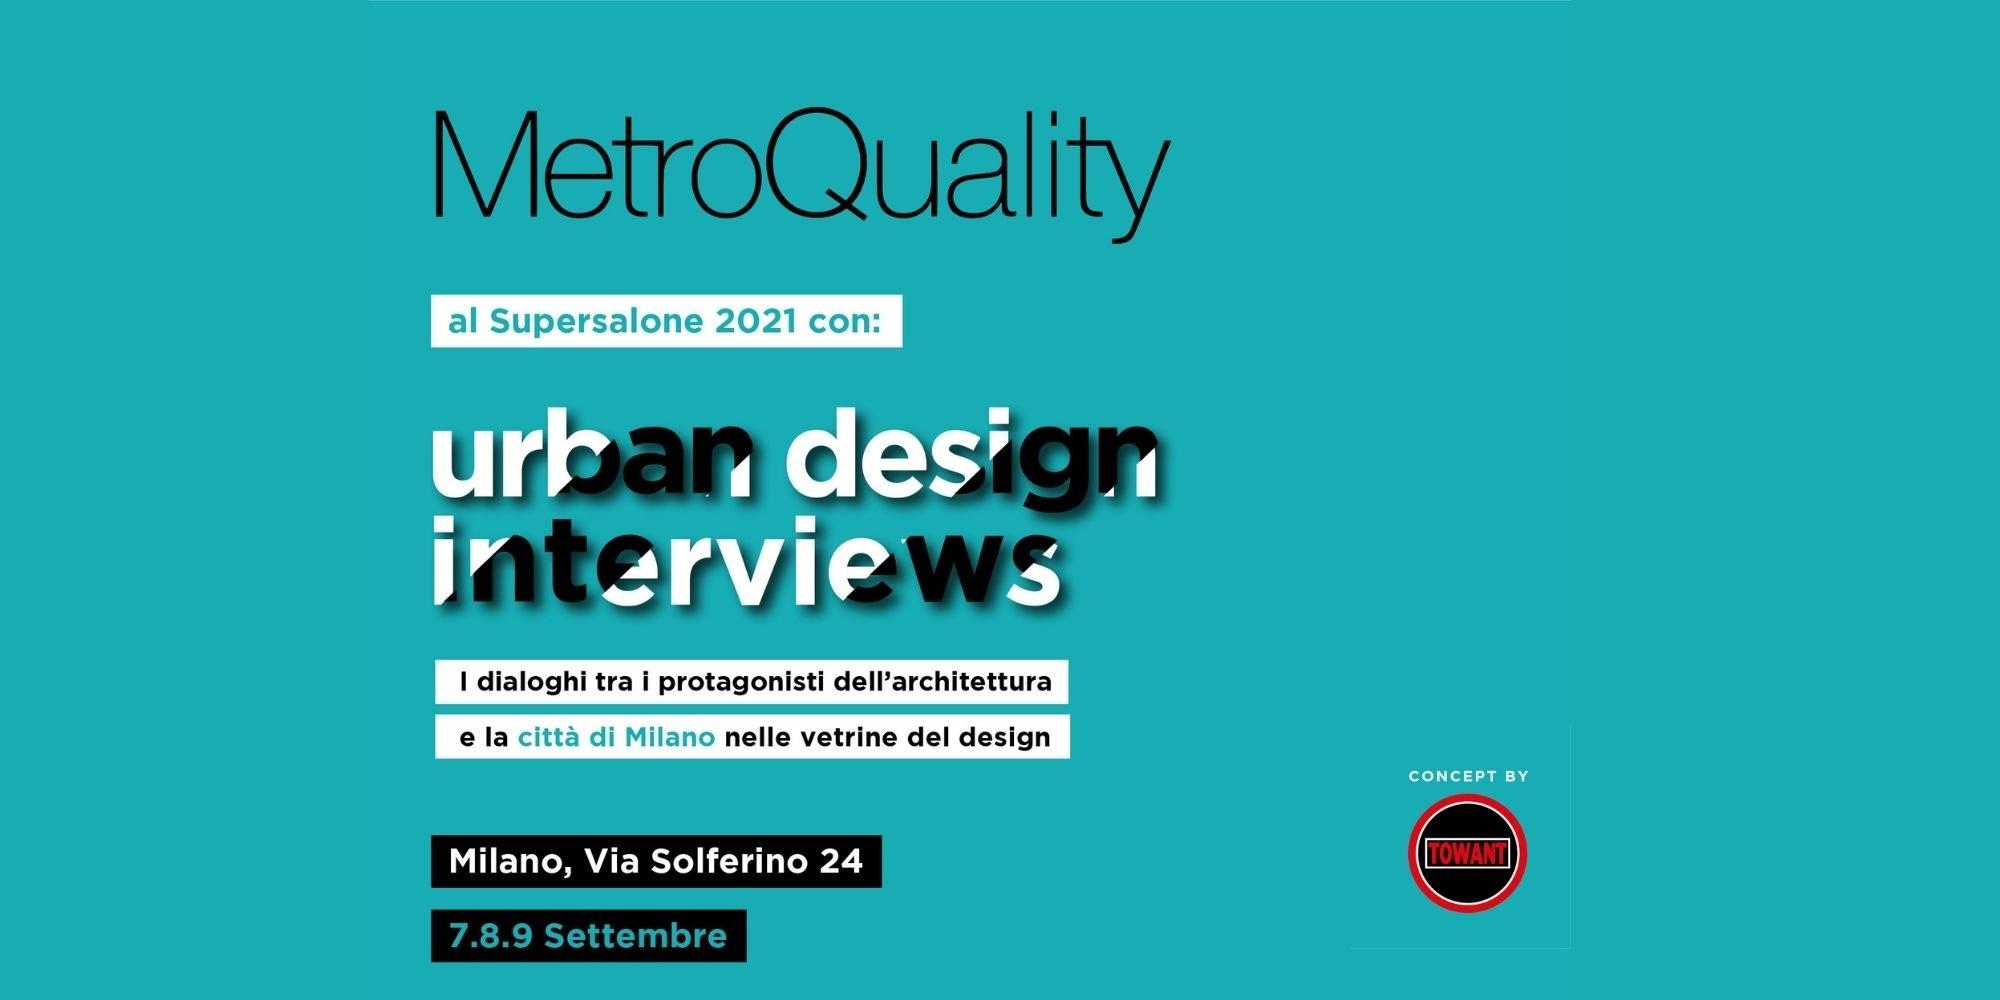 metroquality fuorisalone 2021 urban design interview evento towant